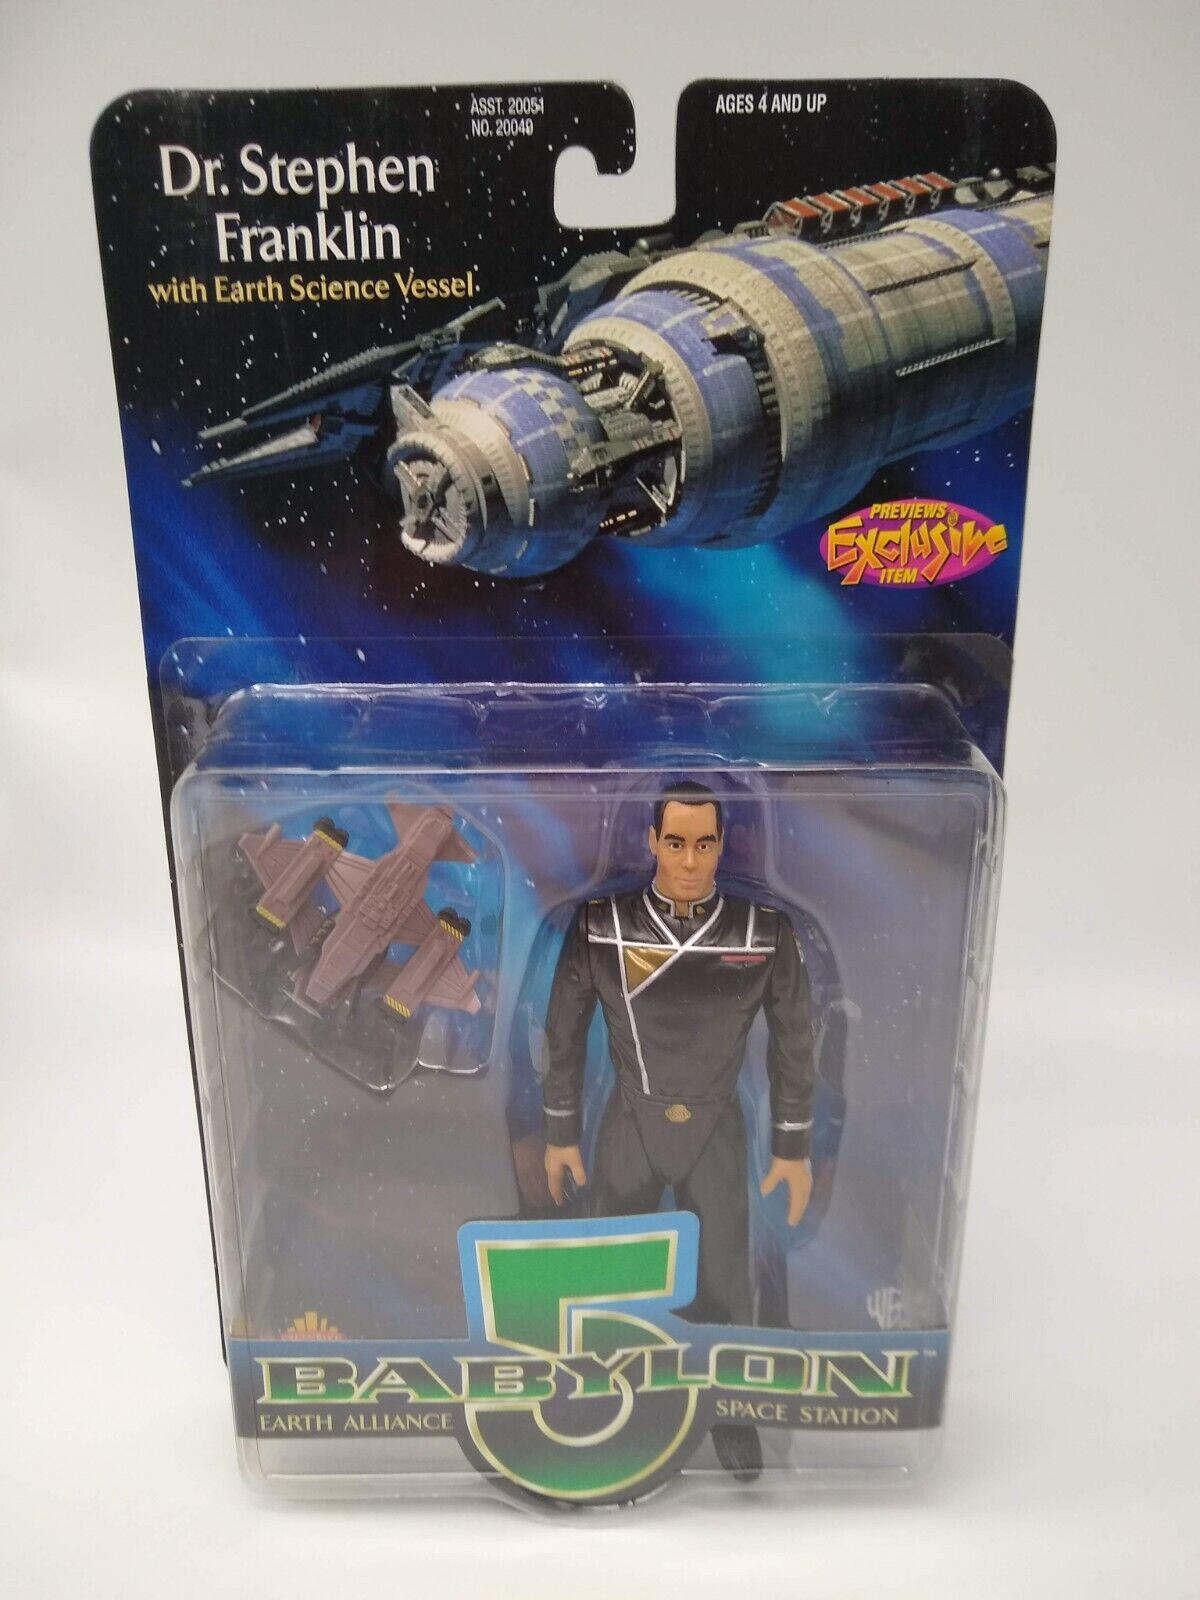 Babylon 5 Dr. Stephen Franklin Previews Exclusive - Factory Sealed